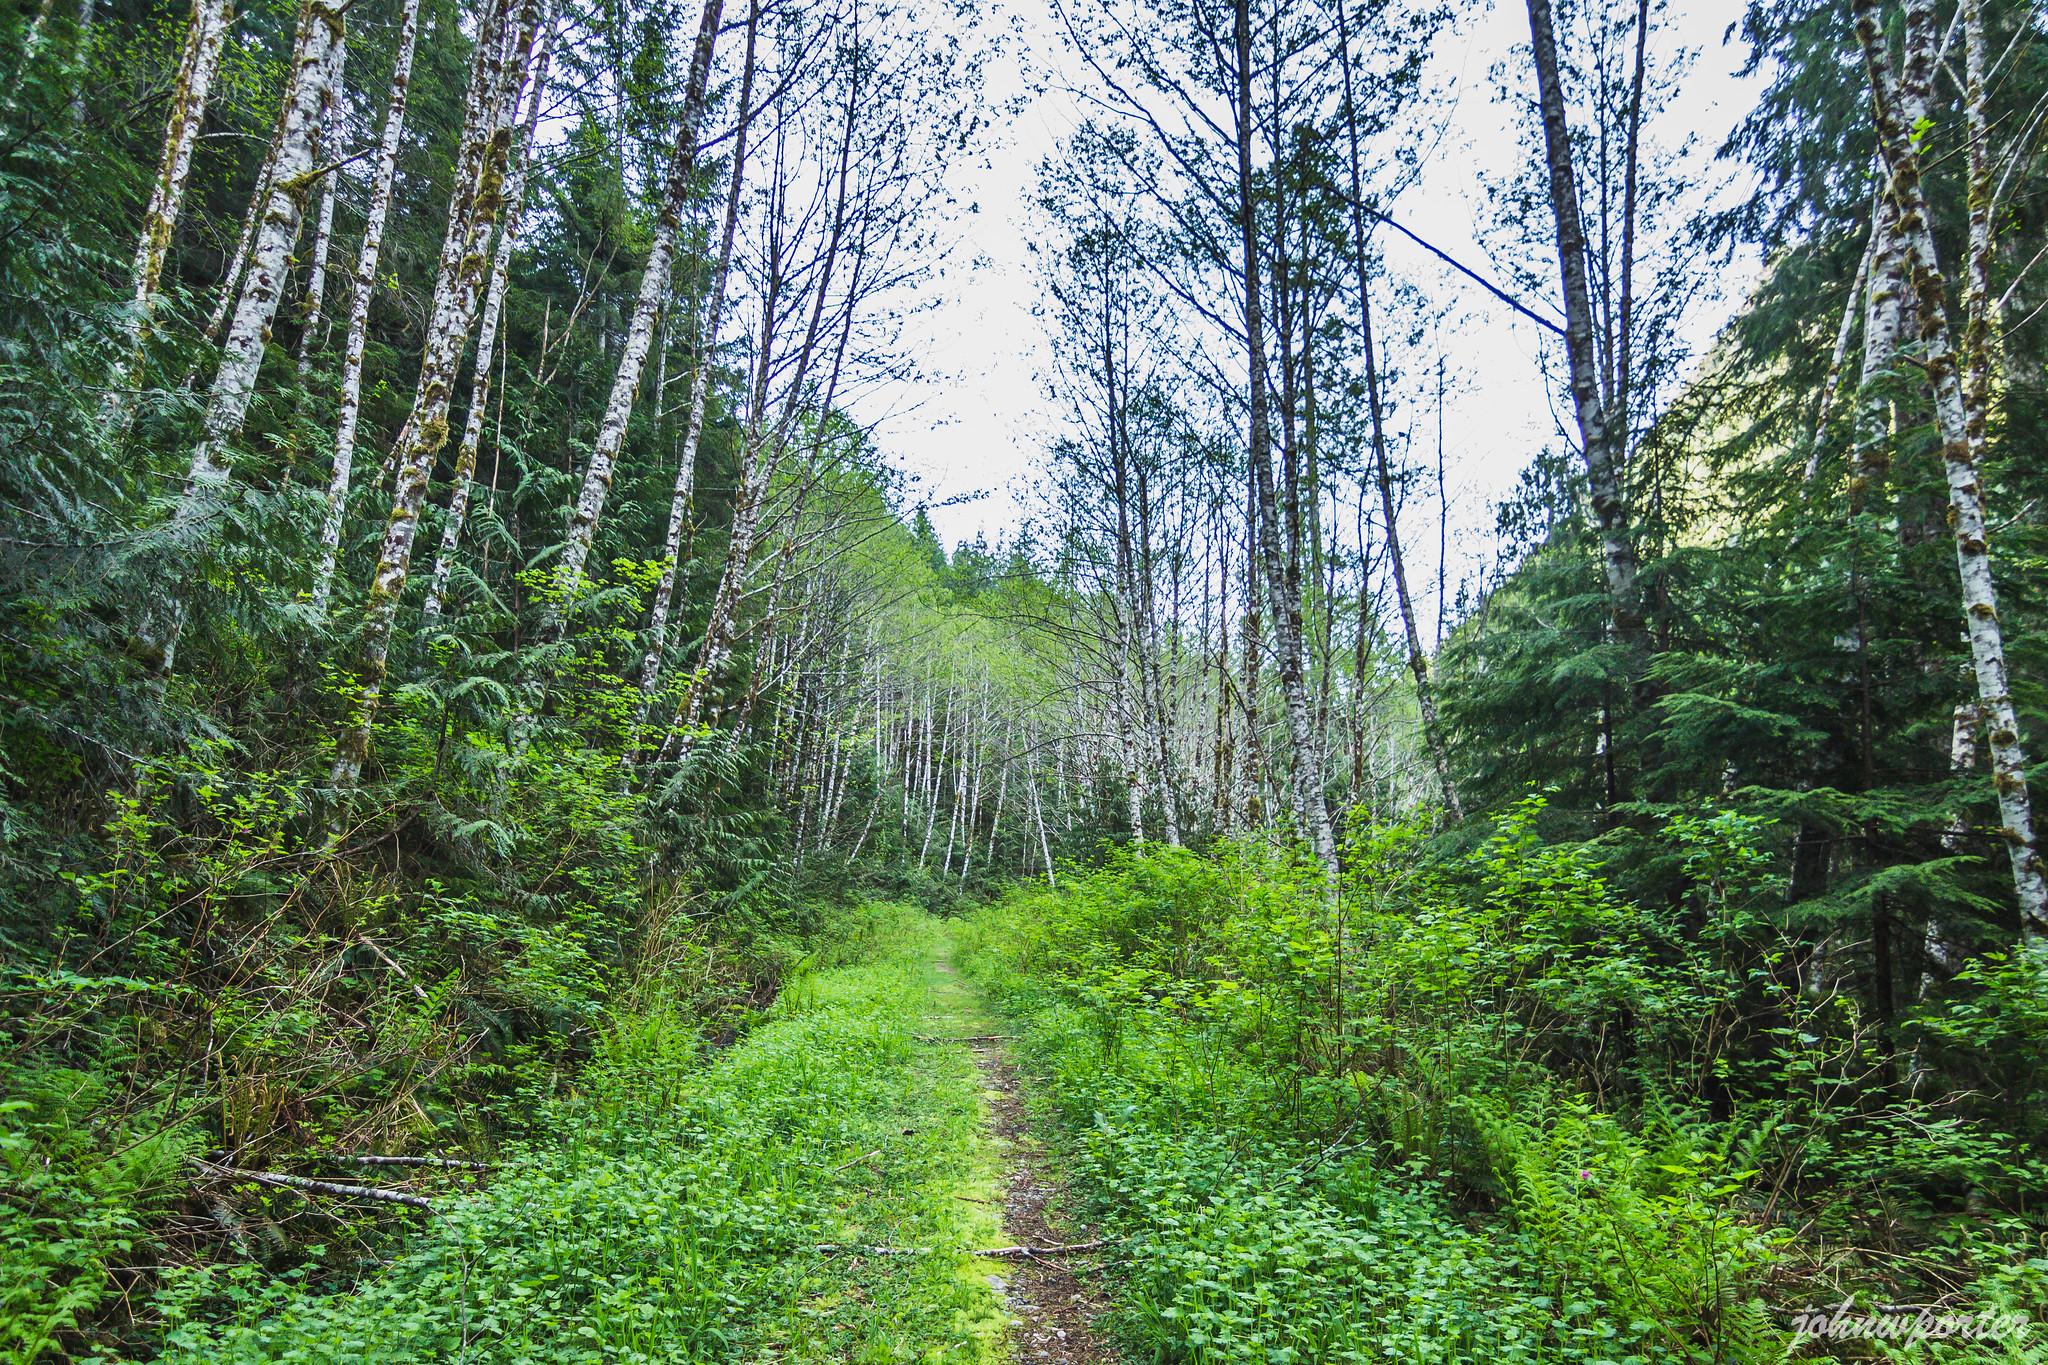 One-mile road walk